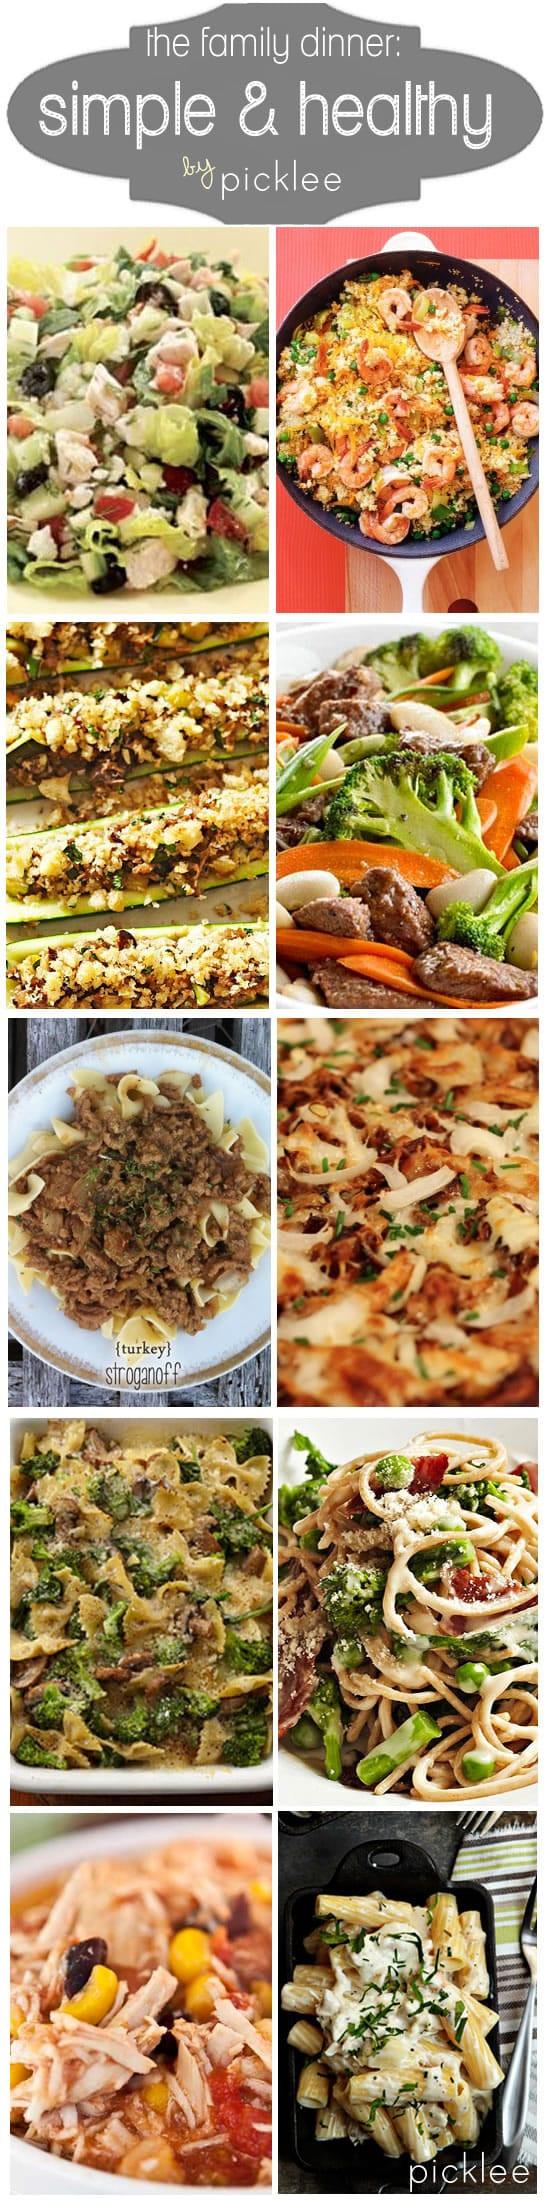 Quick Healthy Weeknight Dinners  10 Simple & Healthy Weeknight Dinners [recipes] Picklee